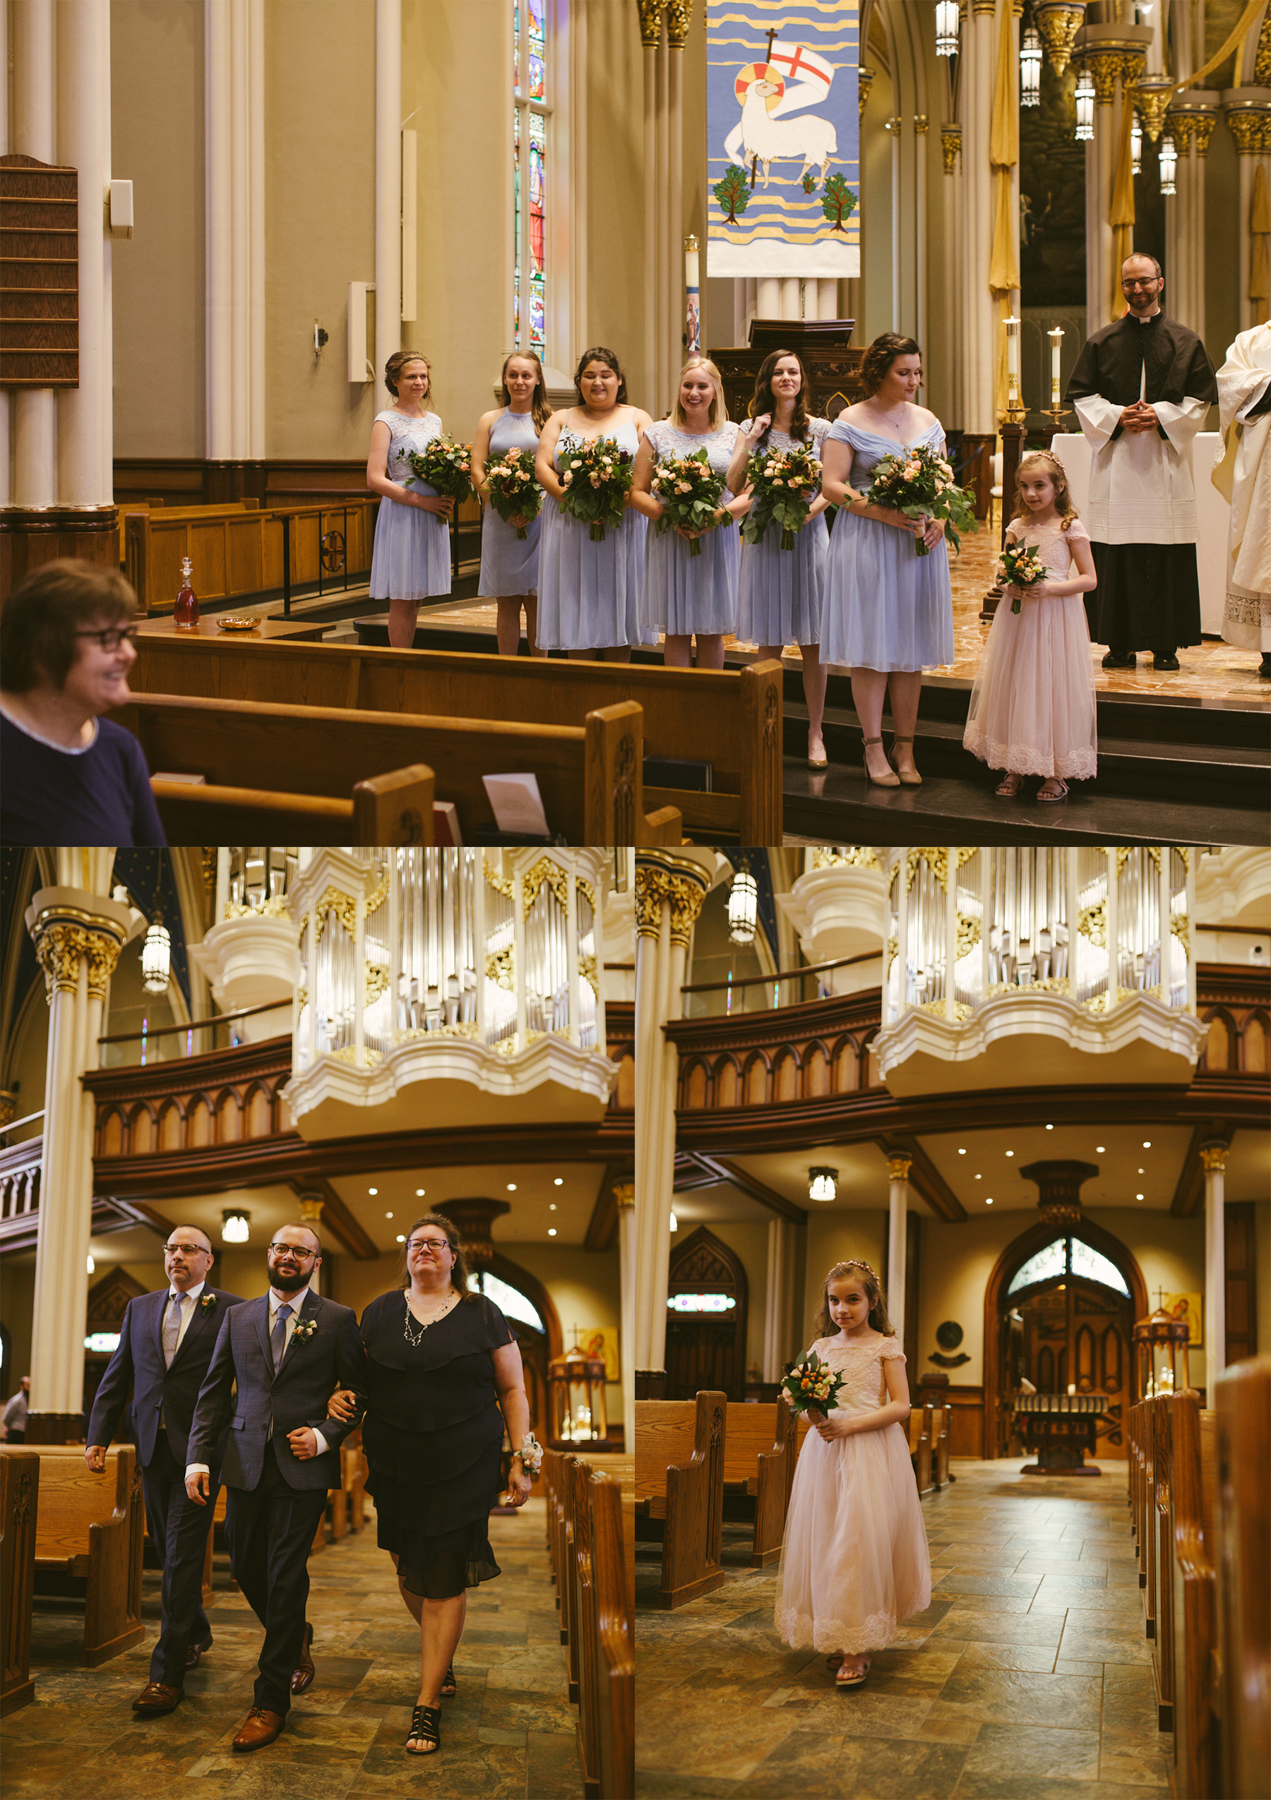 010 may-jimmy-notre-dame-wedding.jpg